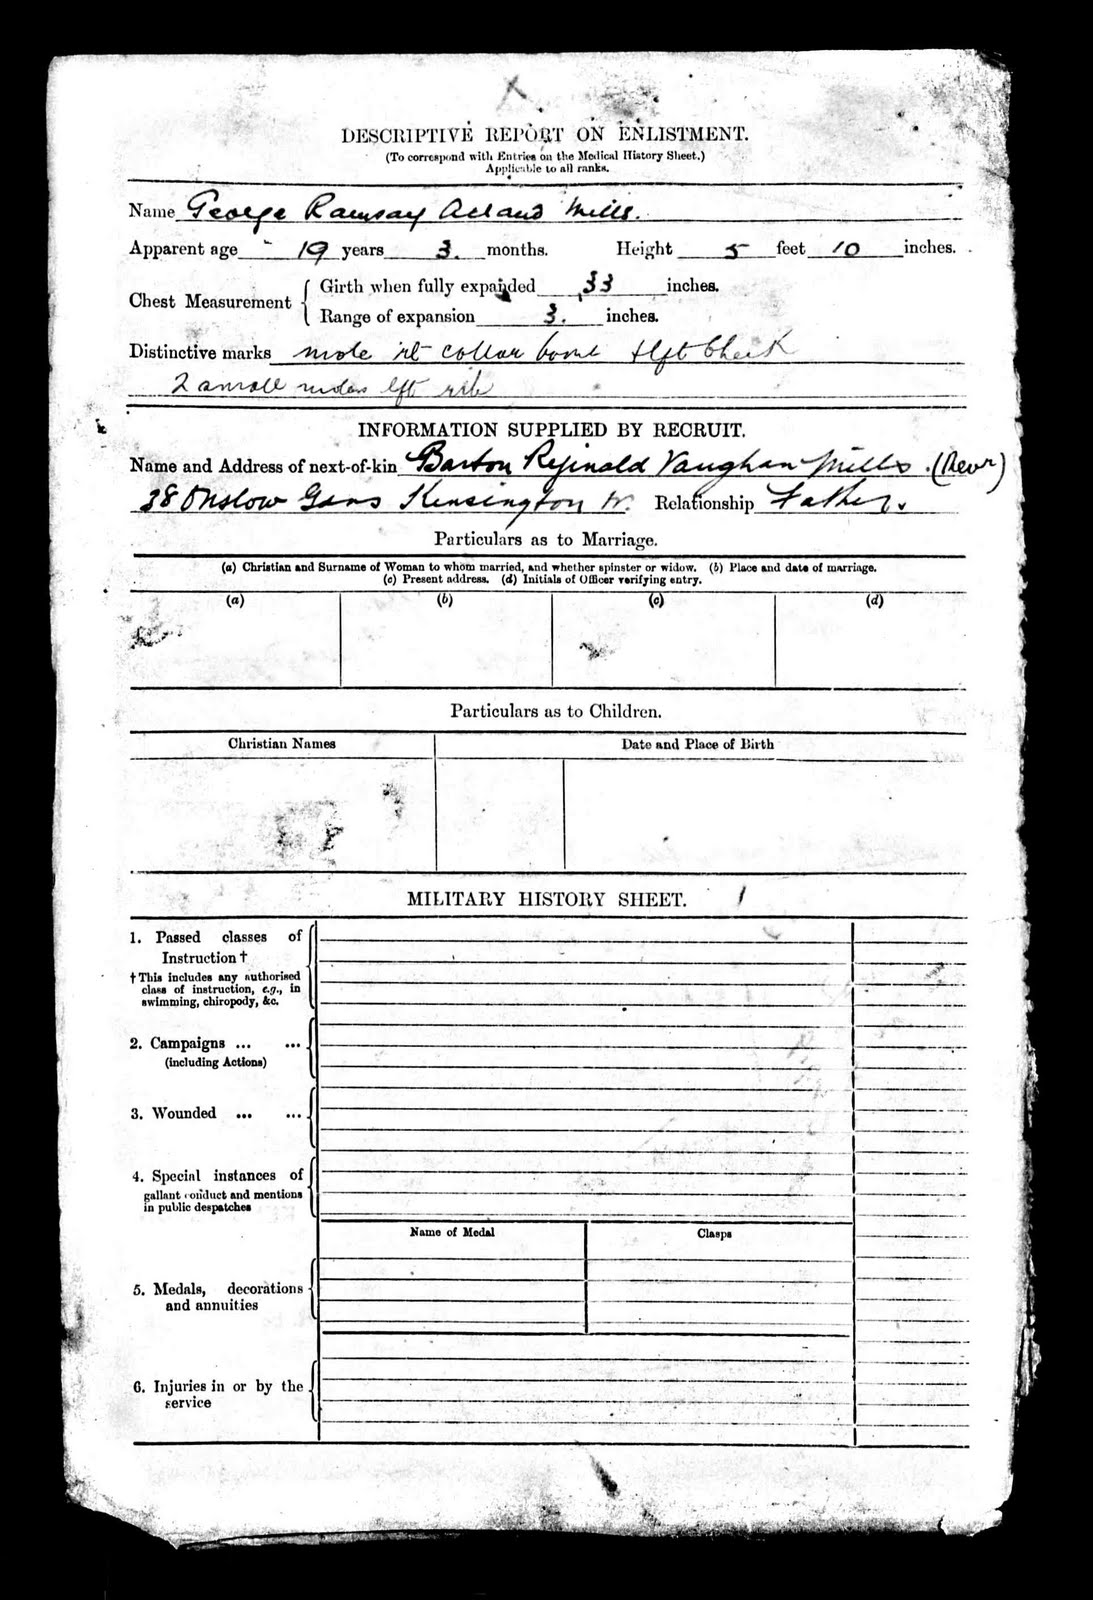 http://4.bp.blogspot.com/-IB3PU12sbnI/TXeg8xNXbxI/AAAAAAAAH0U/3JQbYUEmOa0/s1600/1916_descripitive_report_enlistment_mills.JPG